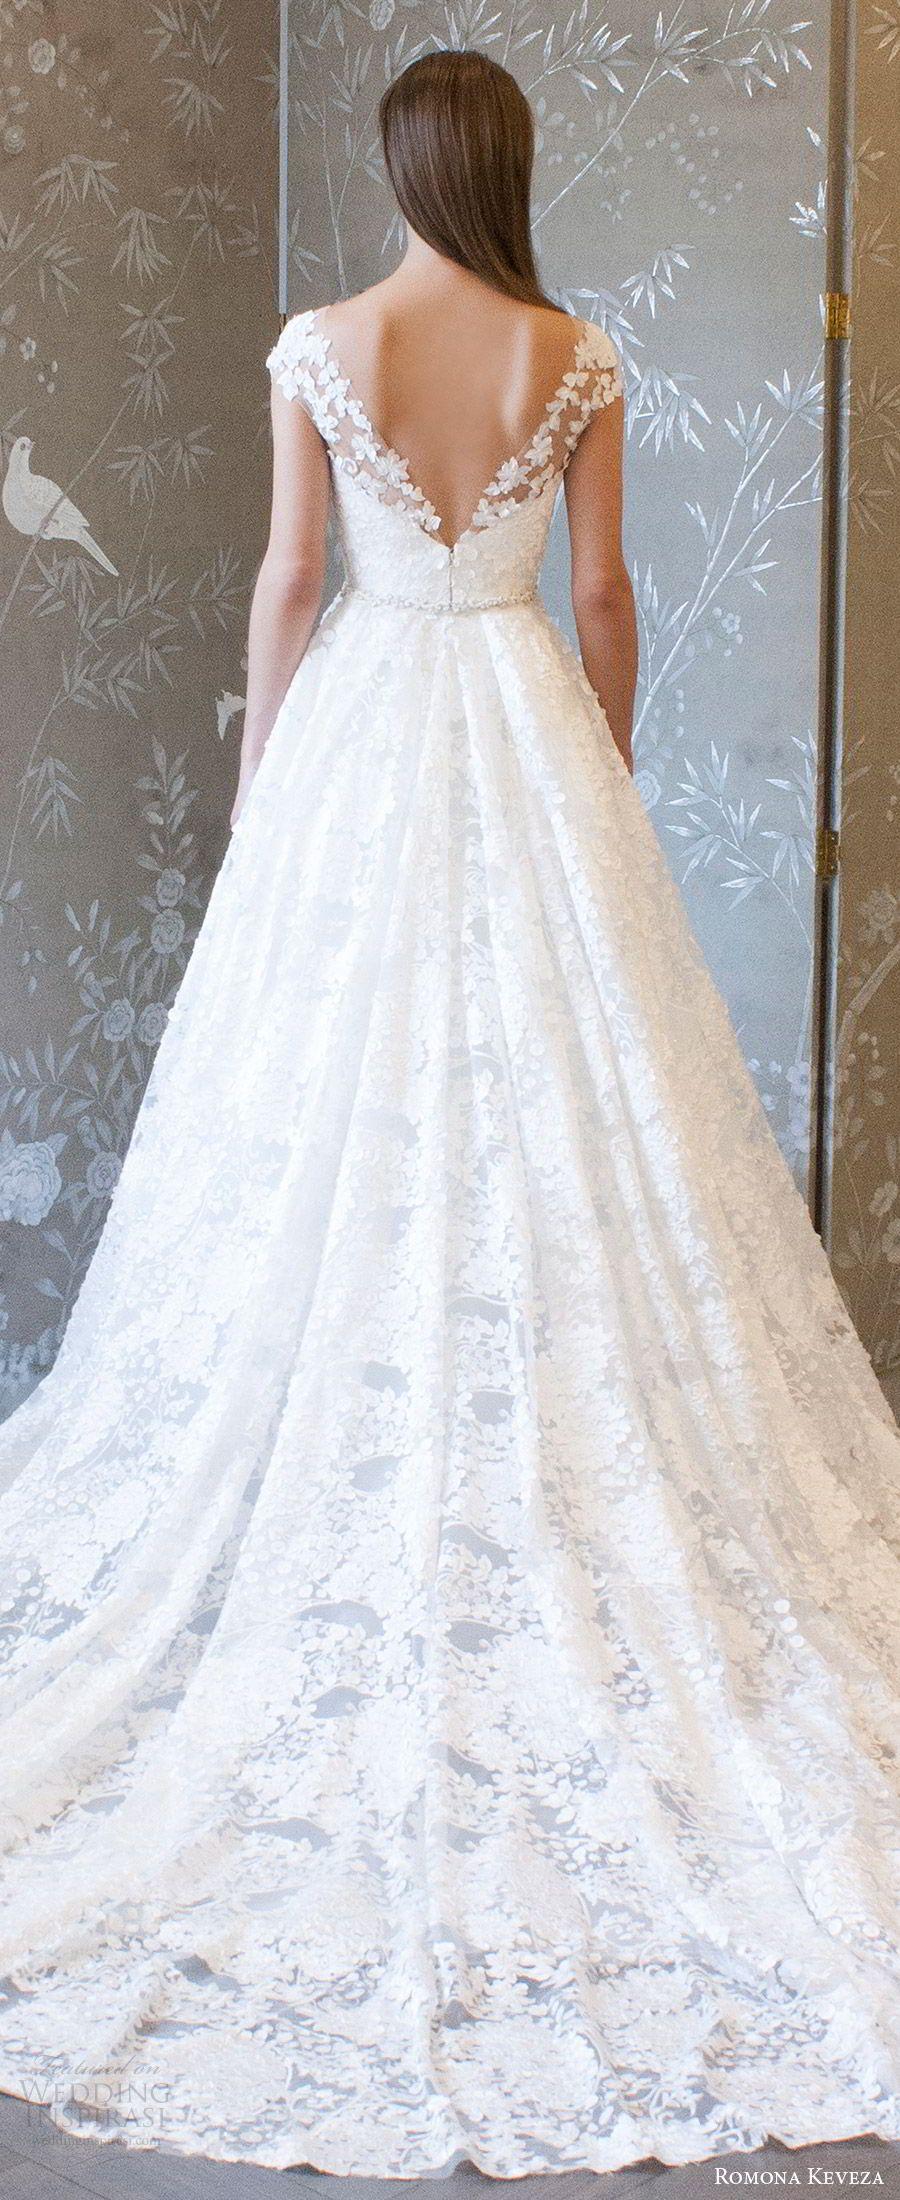 Lace wedding dress with cap sleeves sweetheart neckline  Romona Keveza Collection Spring  Wedding Dresses  Romona Keveza